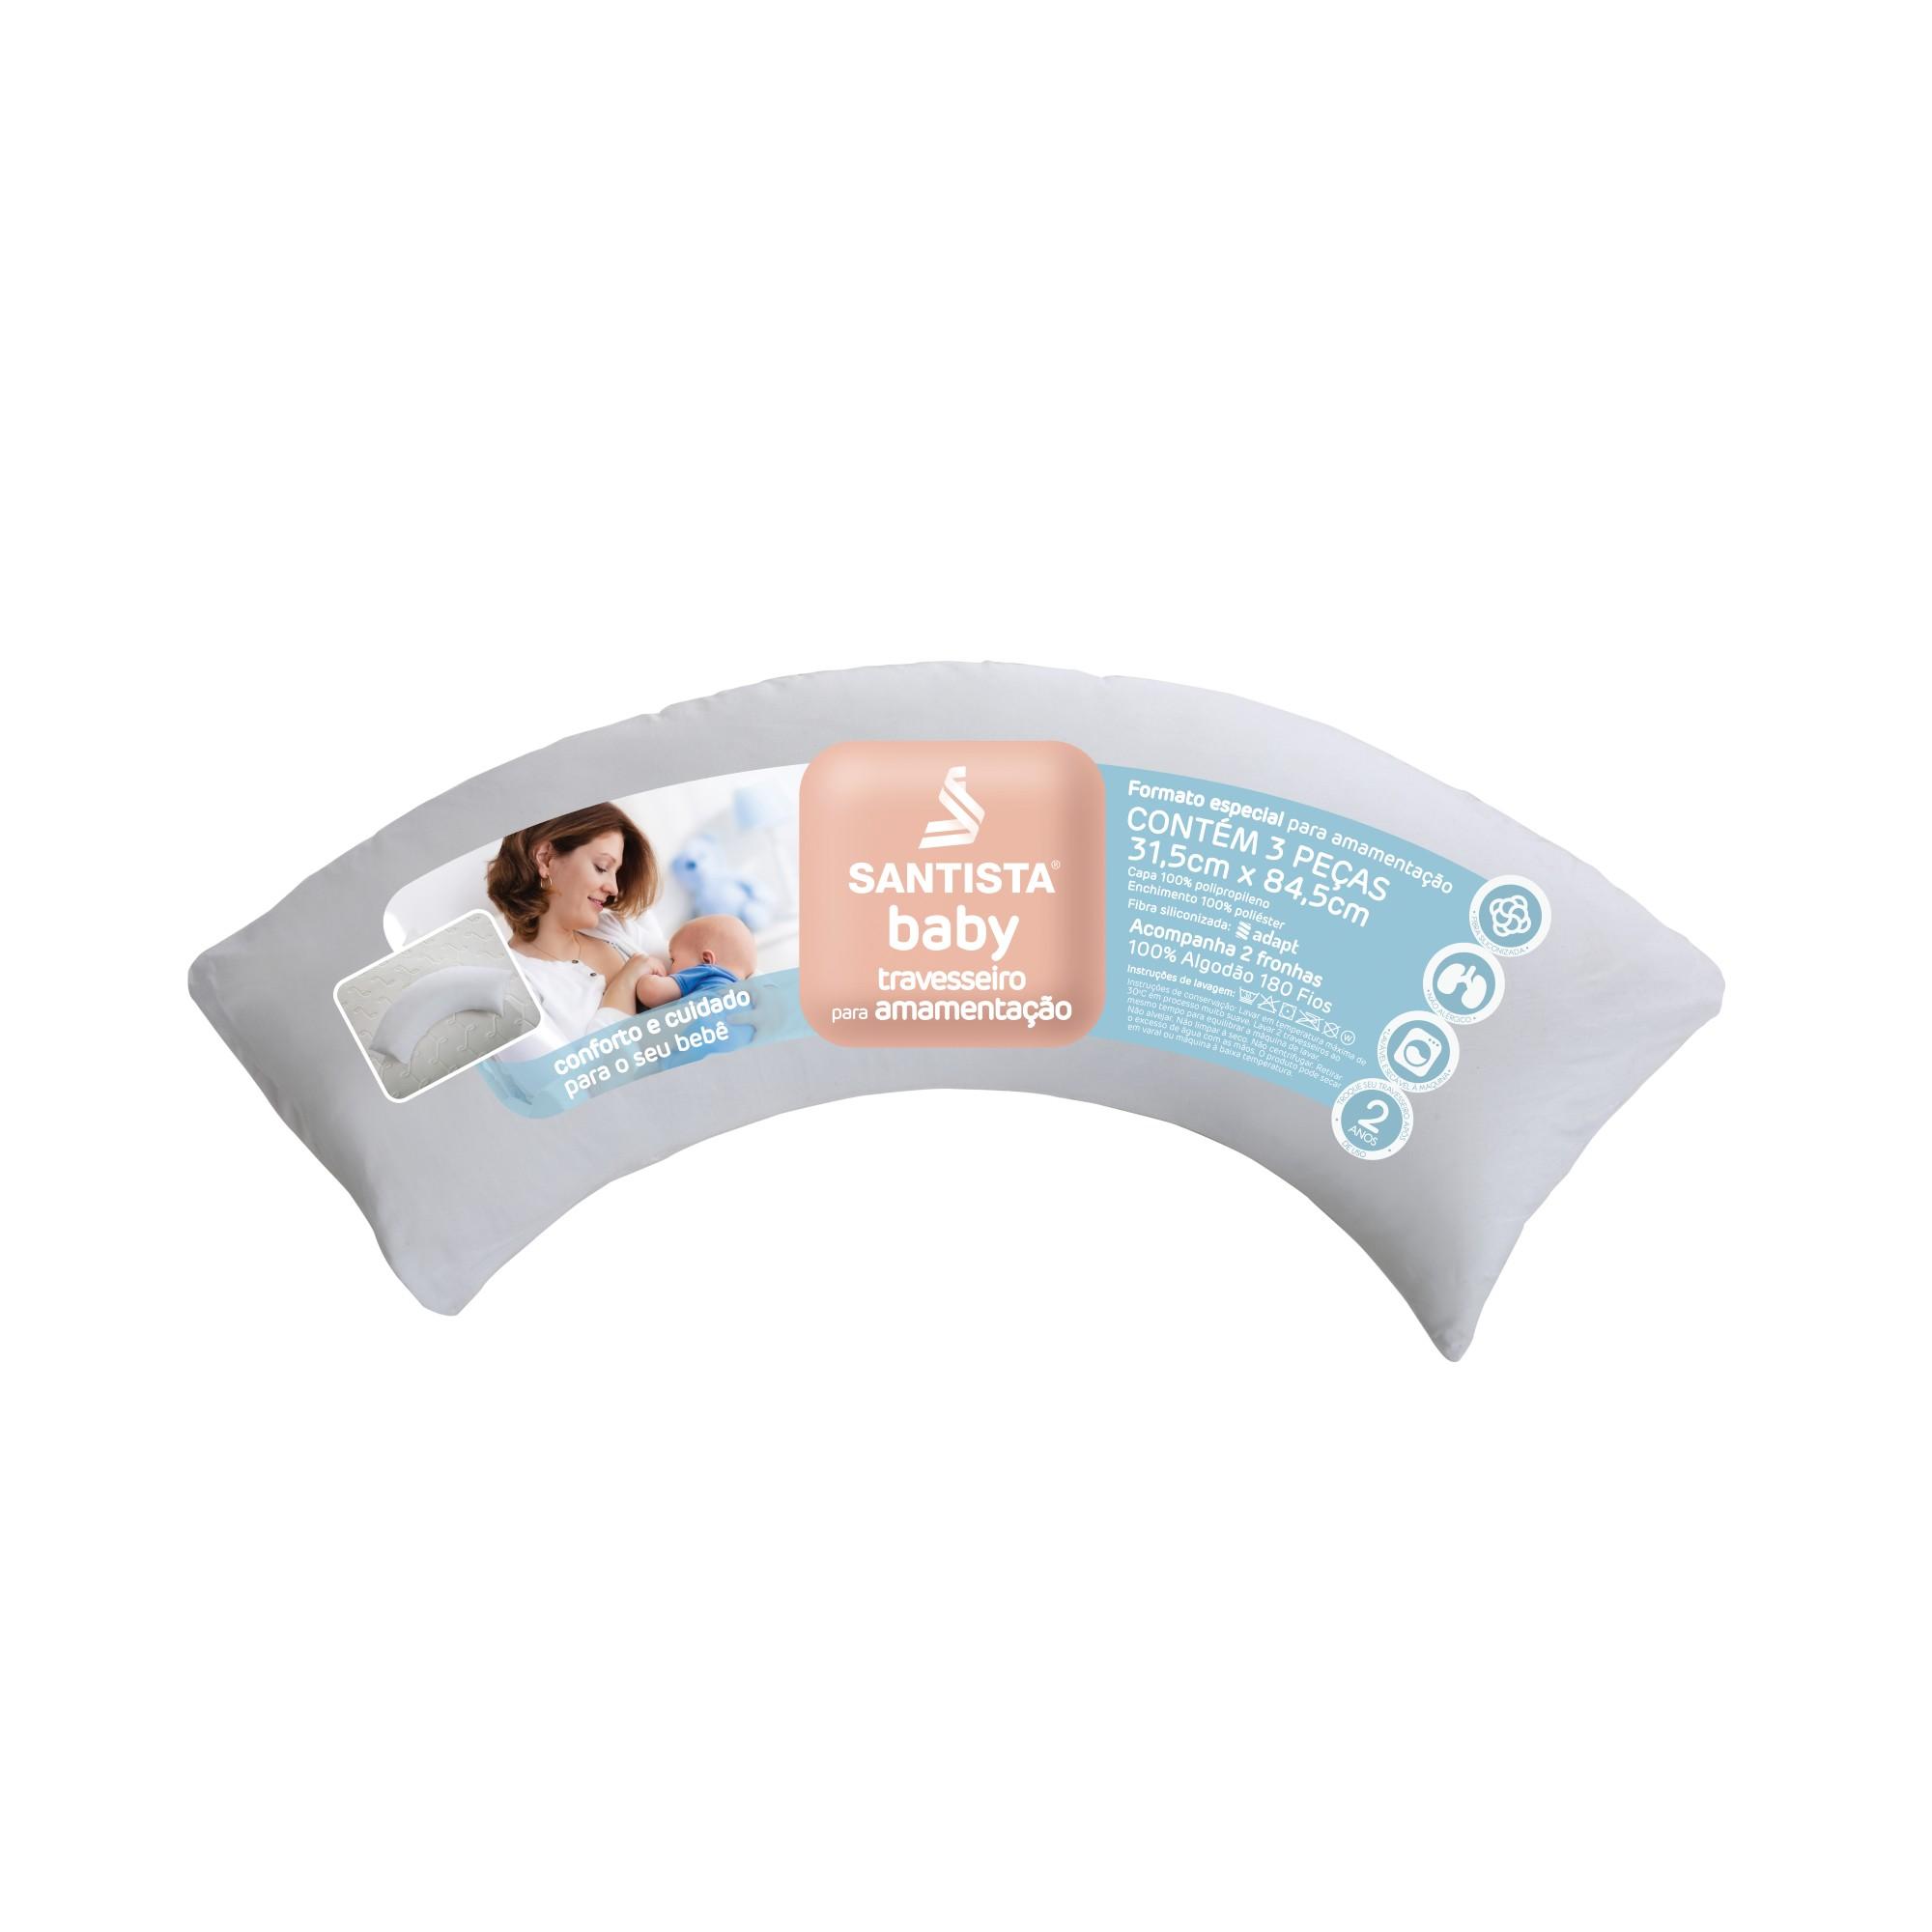 Travesseiro para Amamentacao Baby Branco - Santista